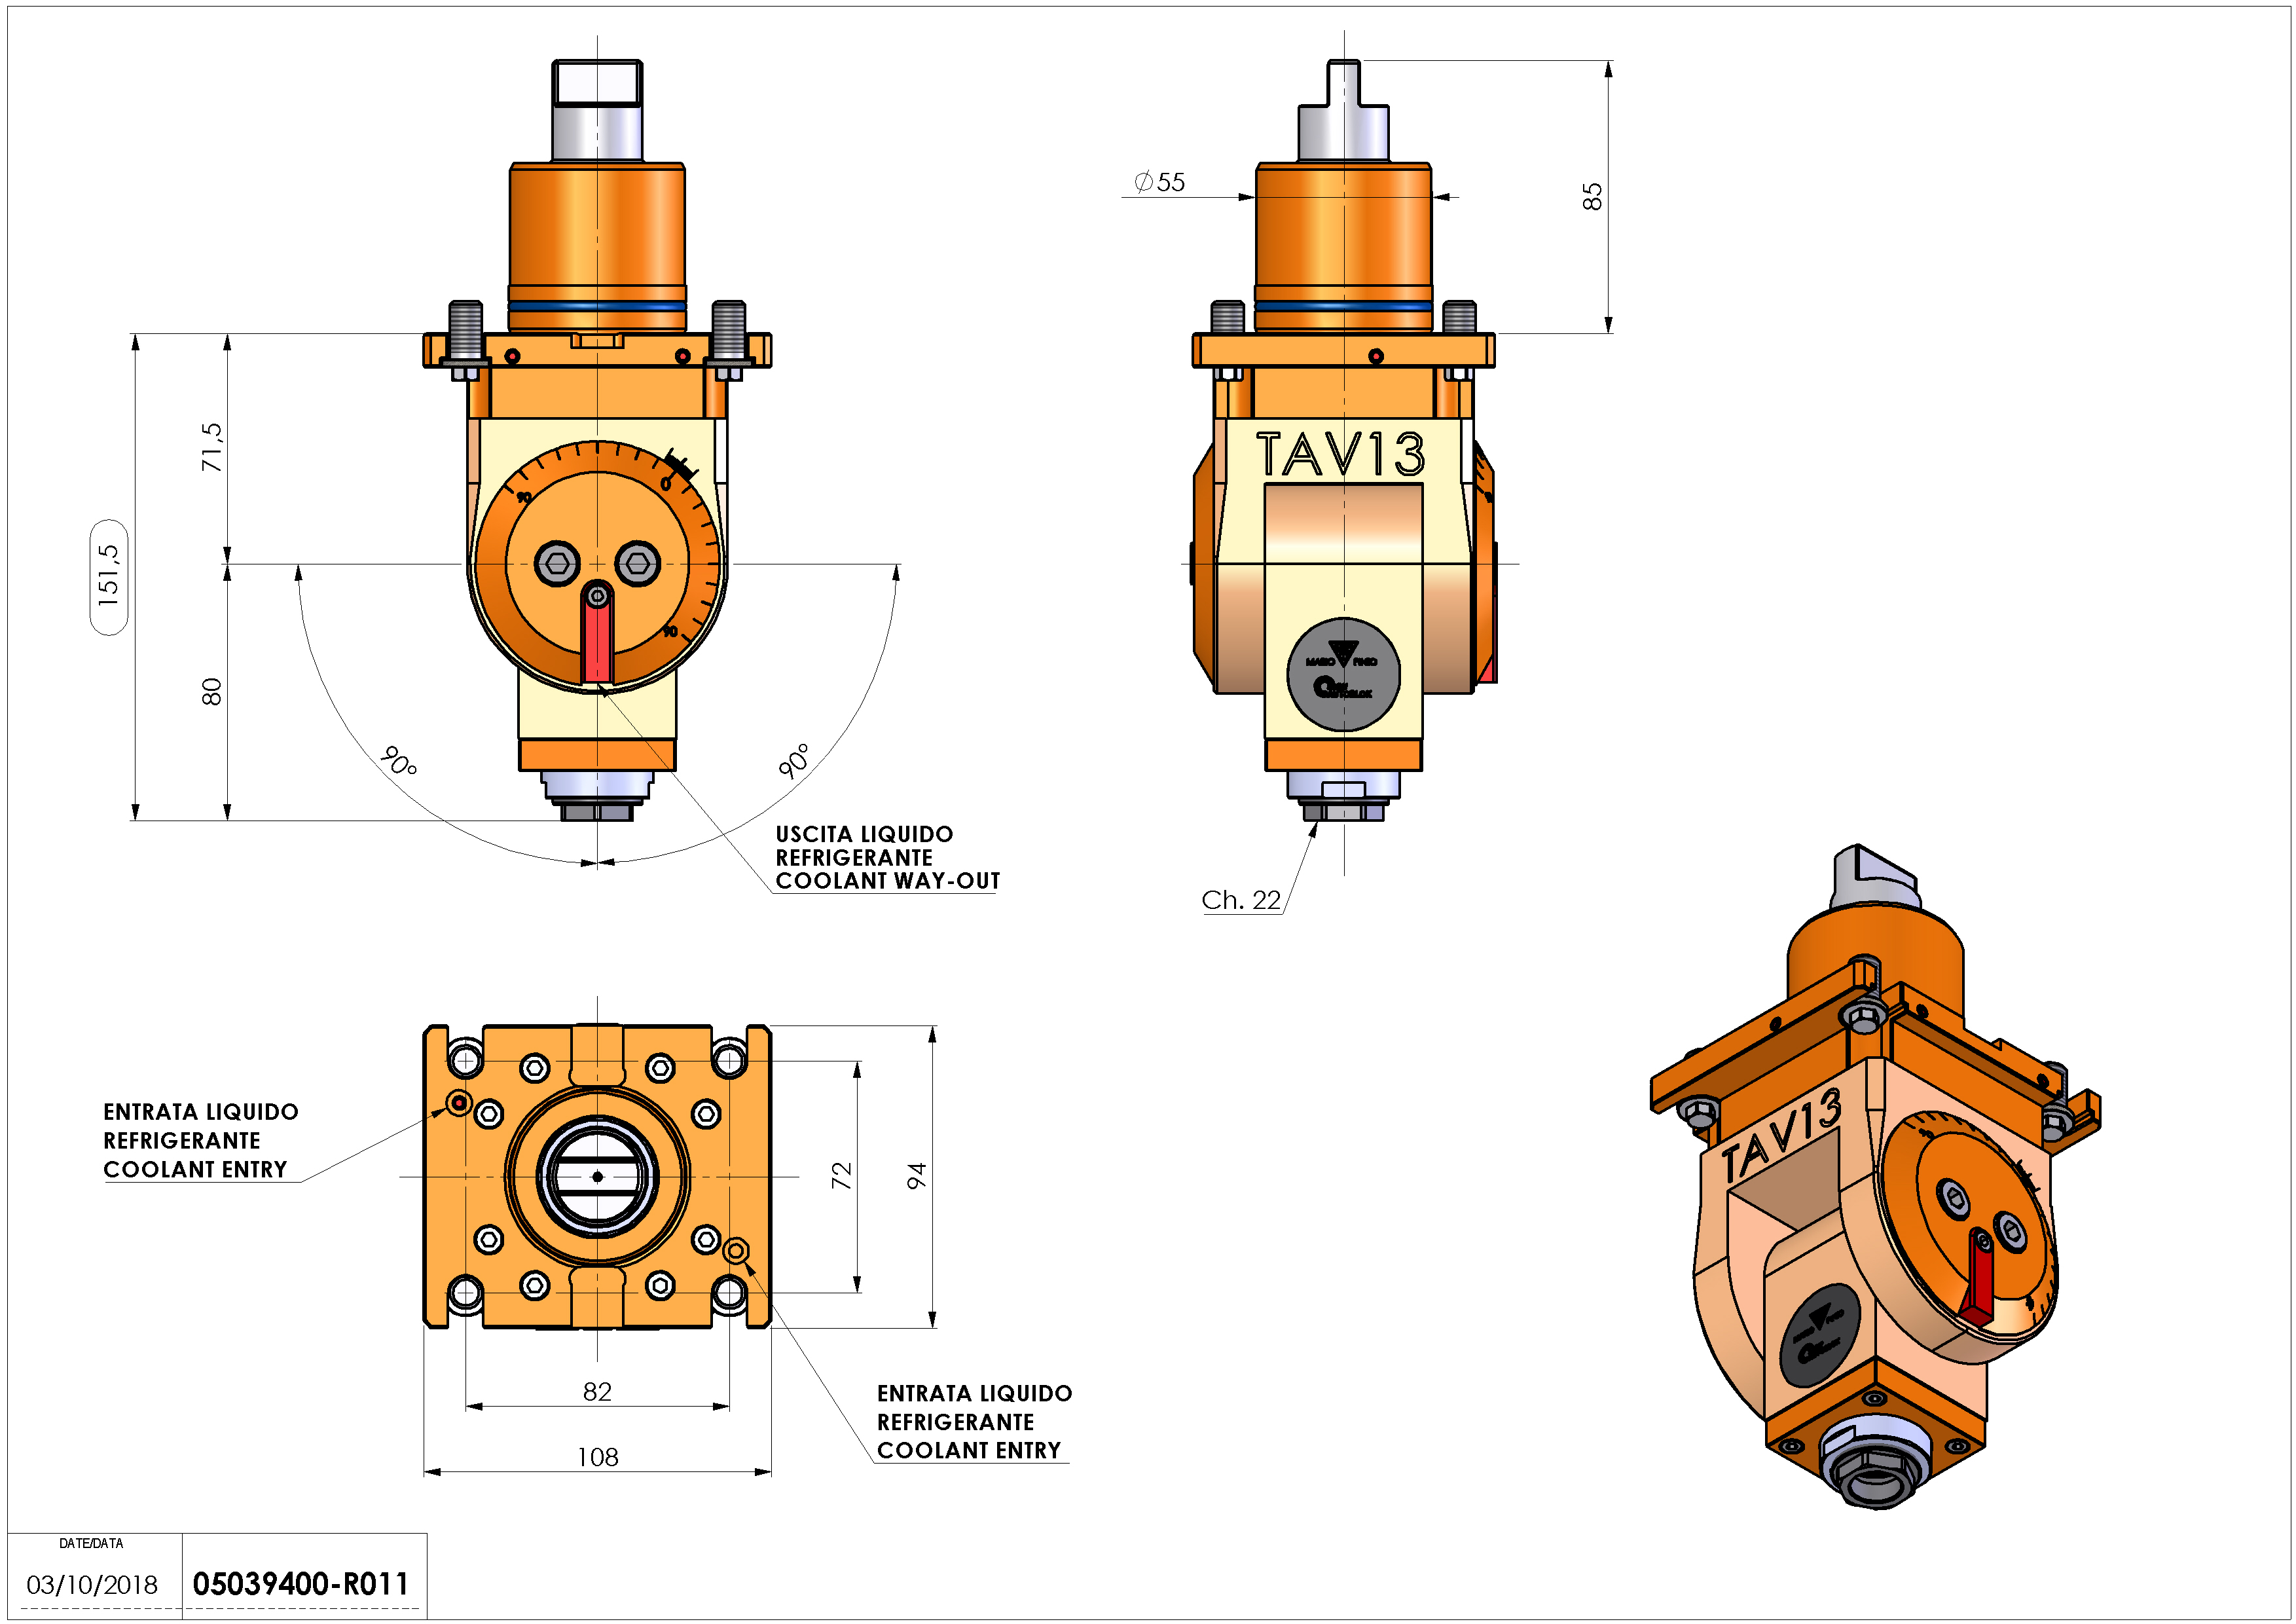 Technical image - LT-T D55 ER20F H72-152.